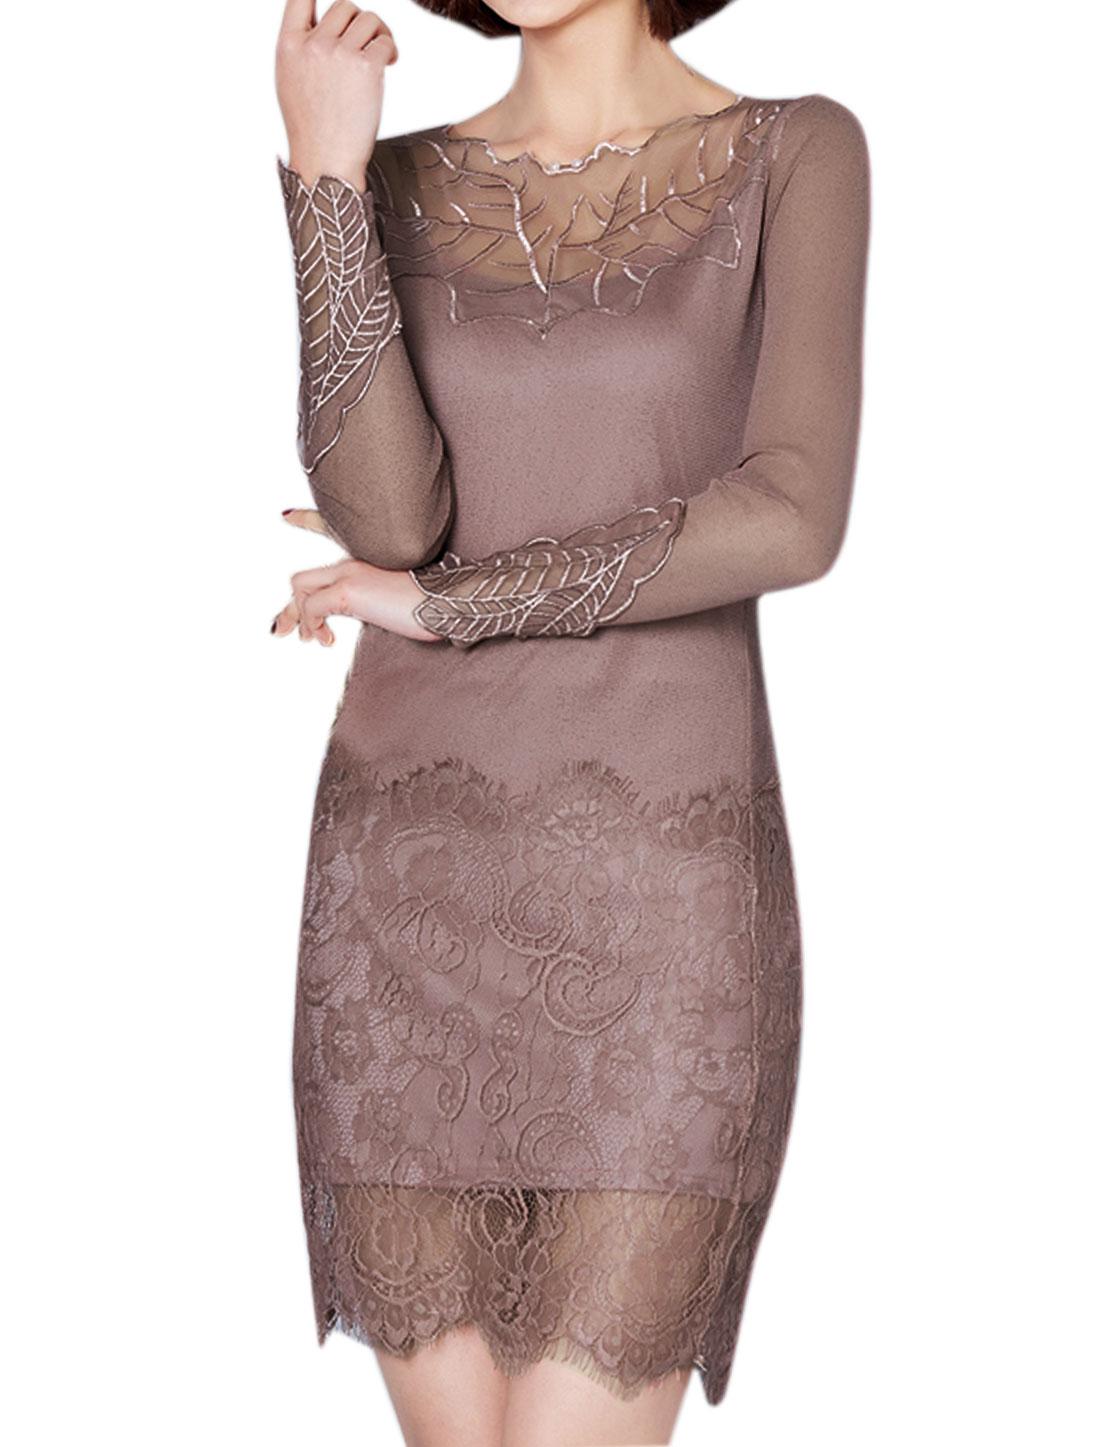 Women Leaf Embroidered Mesh Floral Lace Panel Sheath Dress Purple M